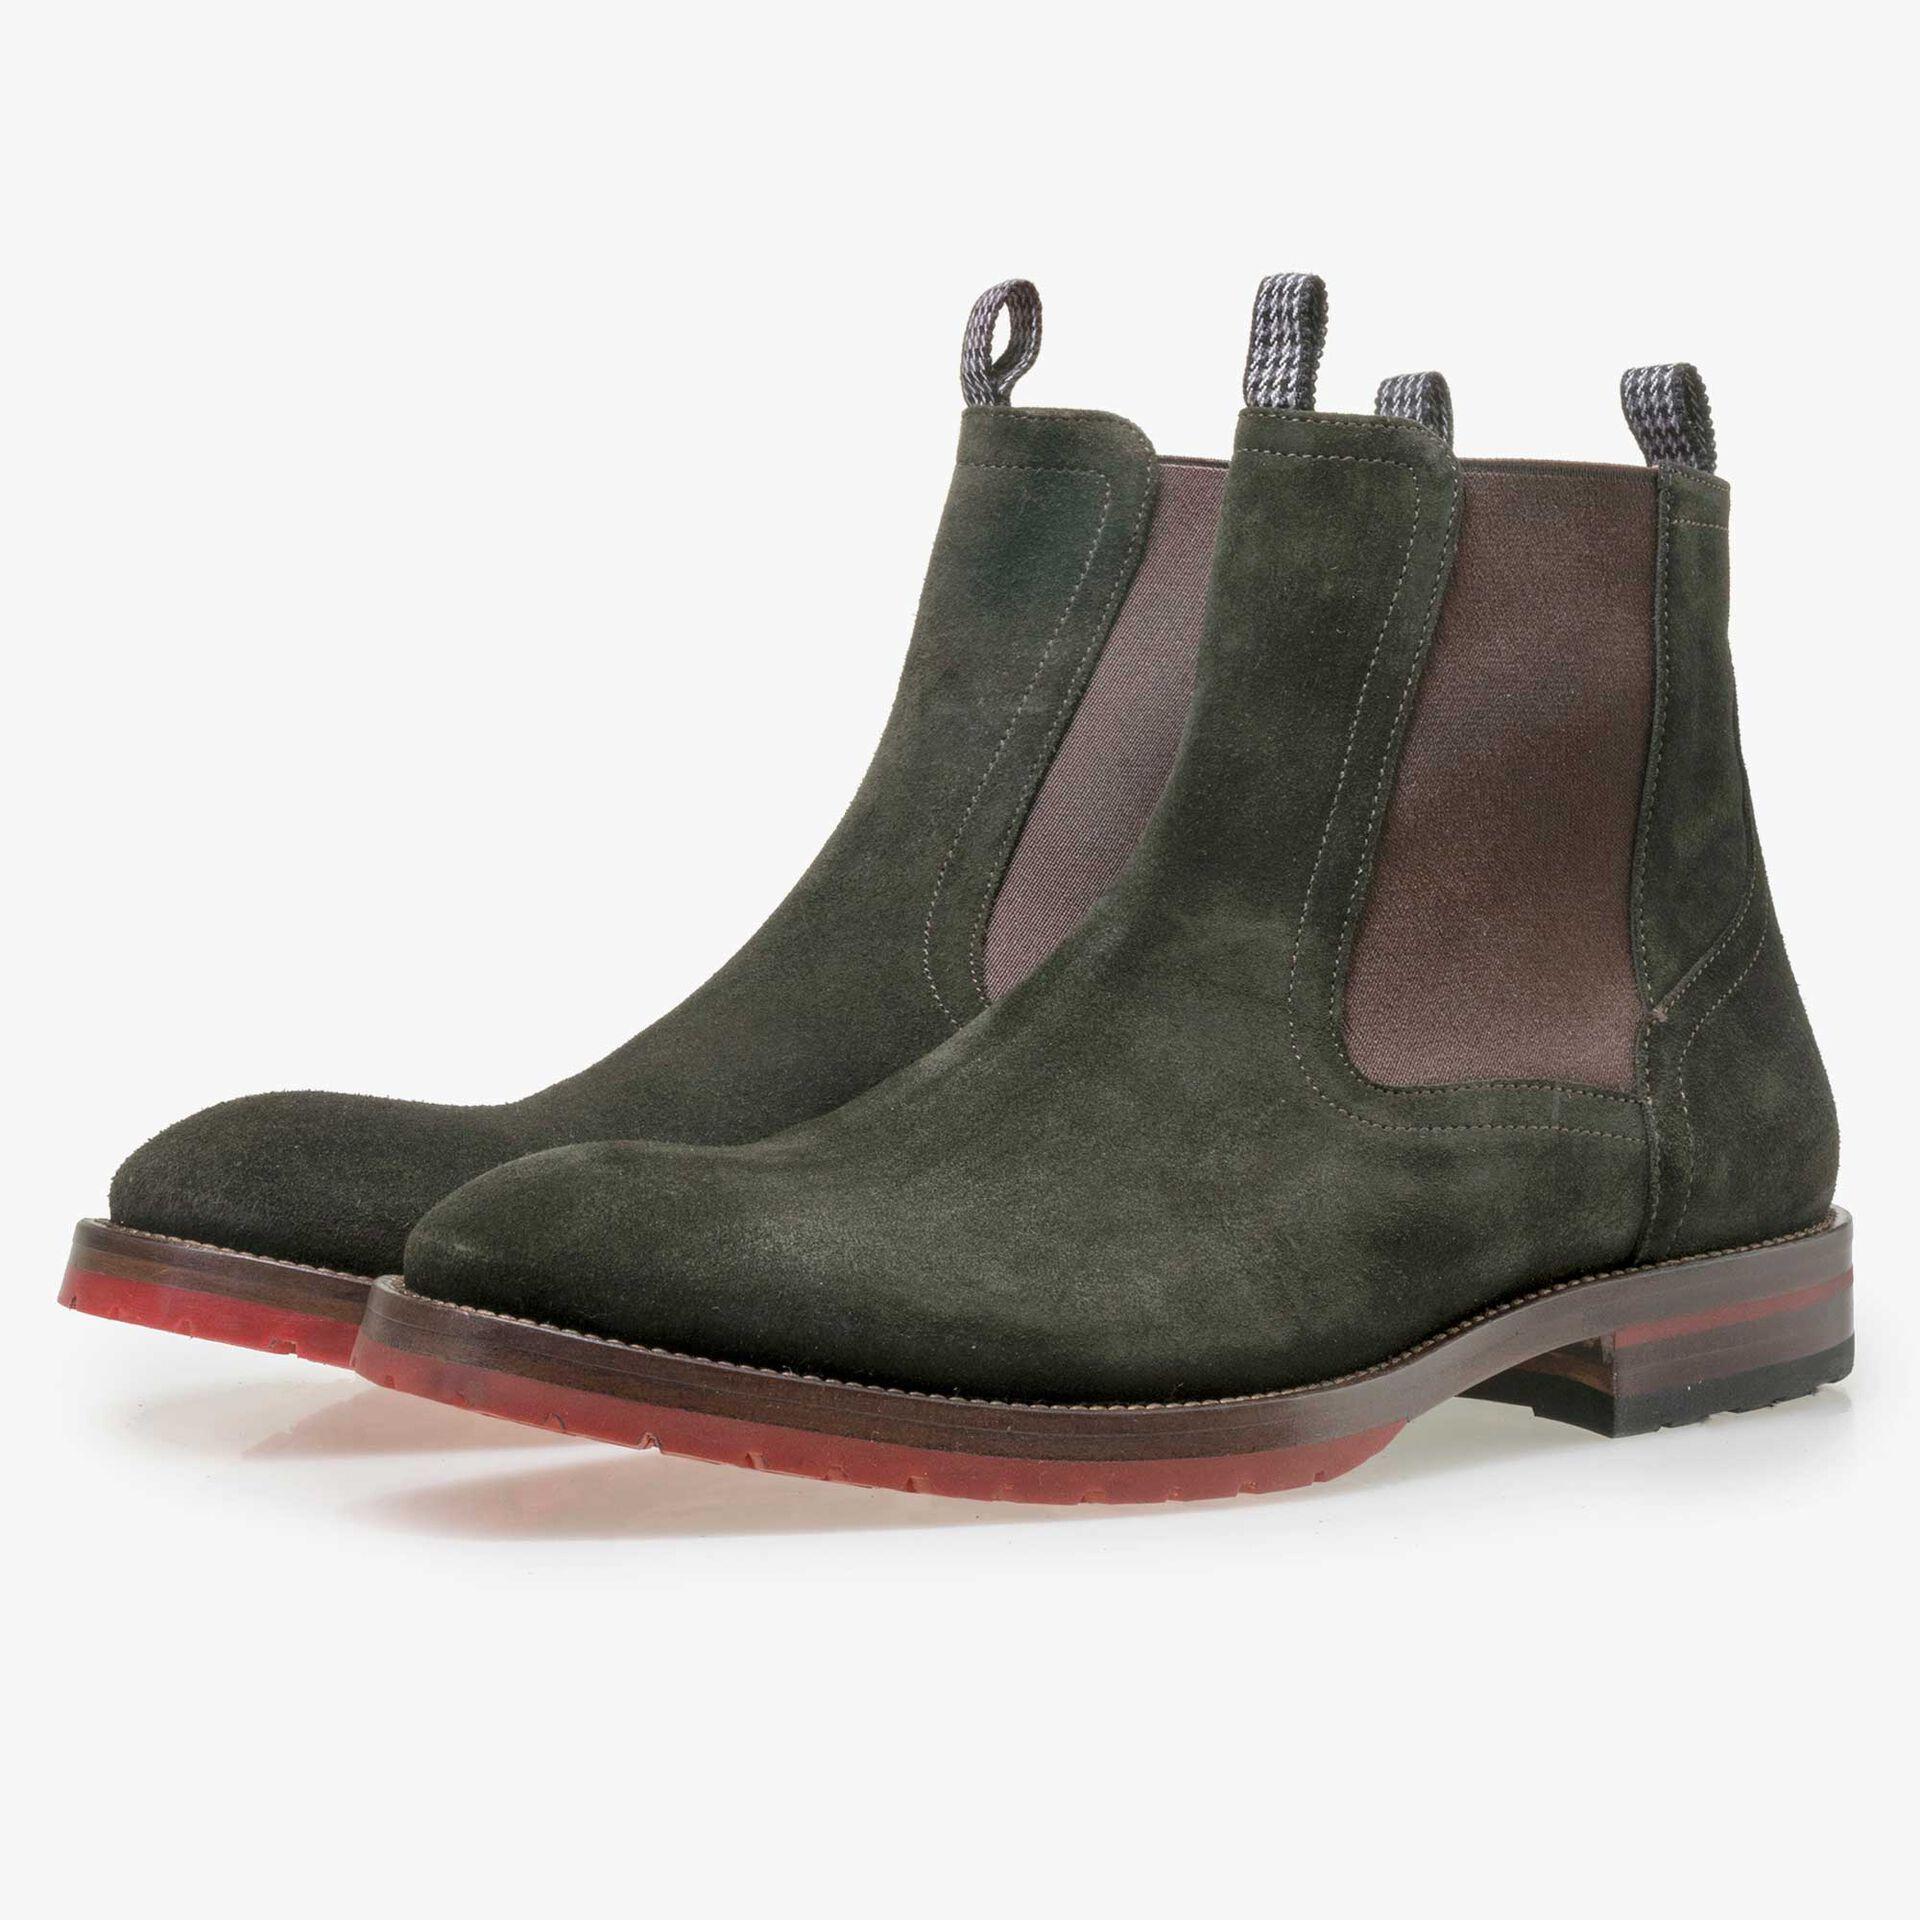 Floris van Bommel olivgrüner Herren Wildleder Chelsea Boot